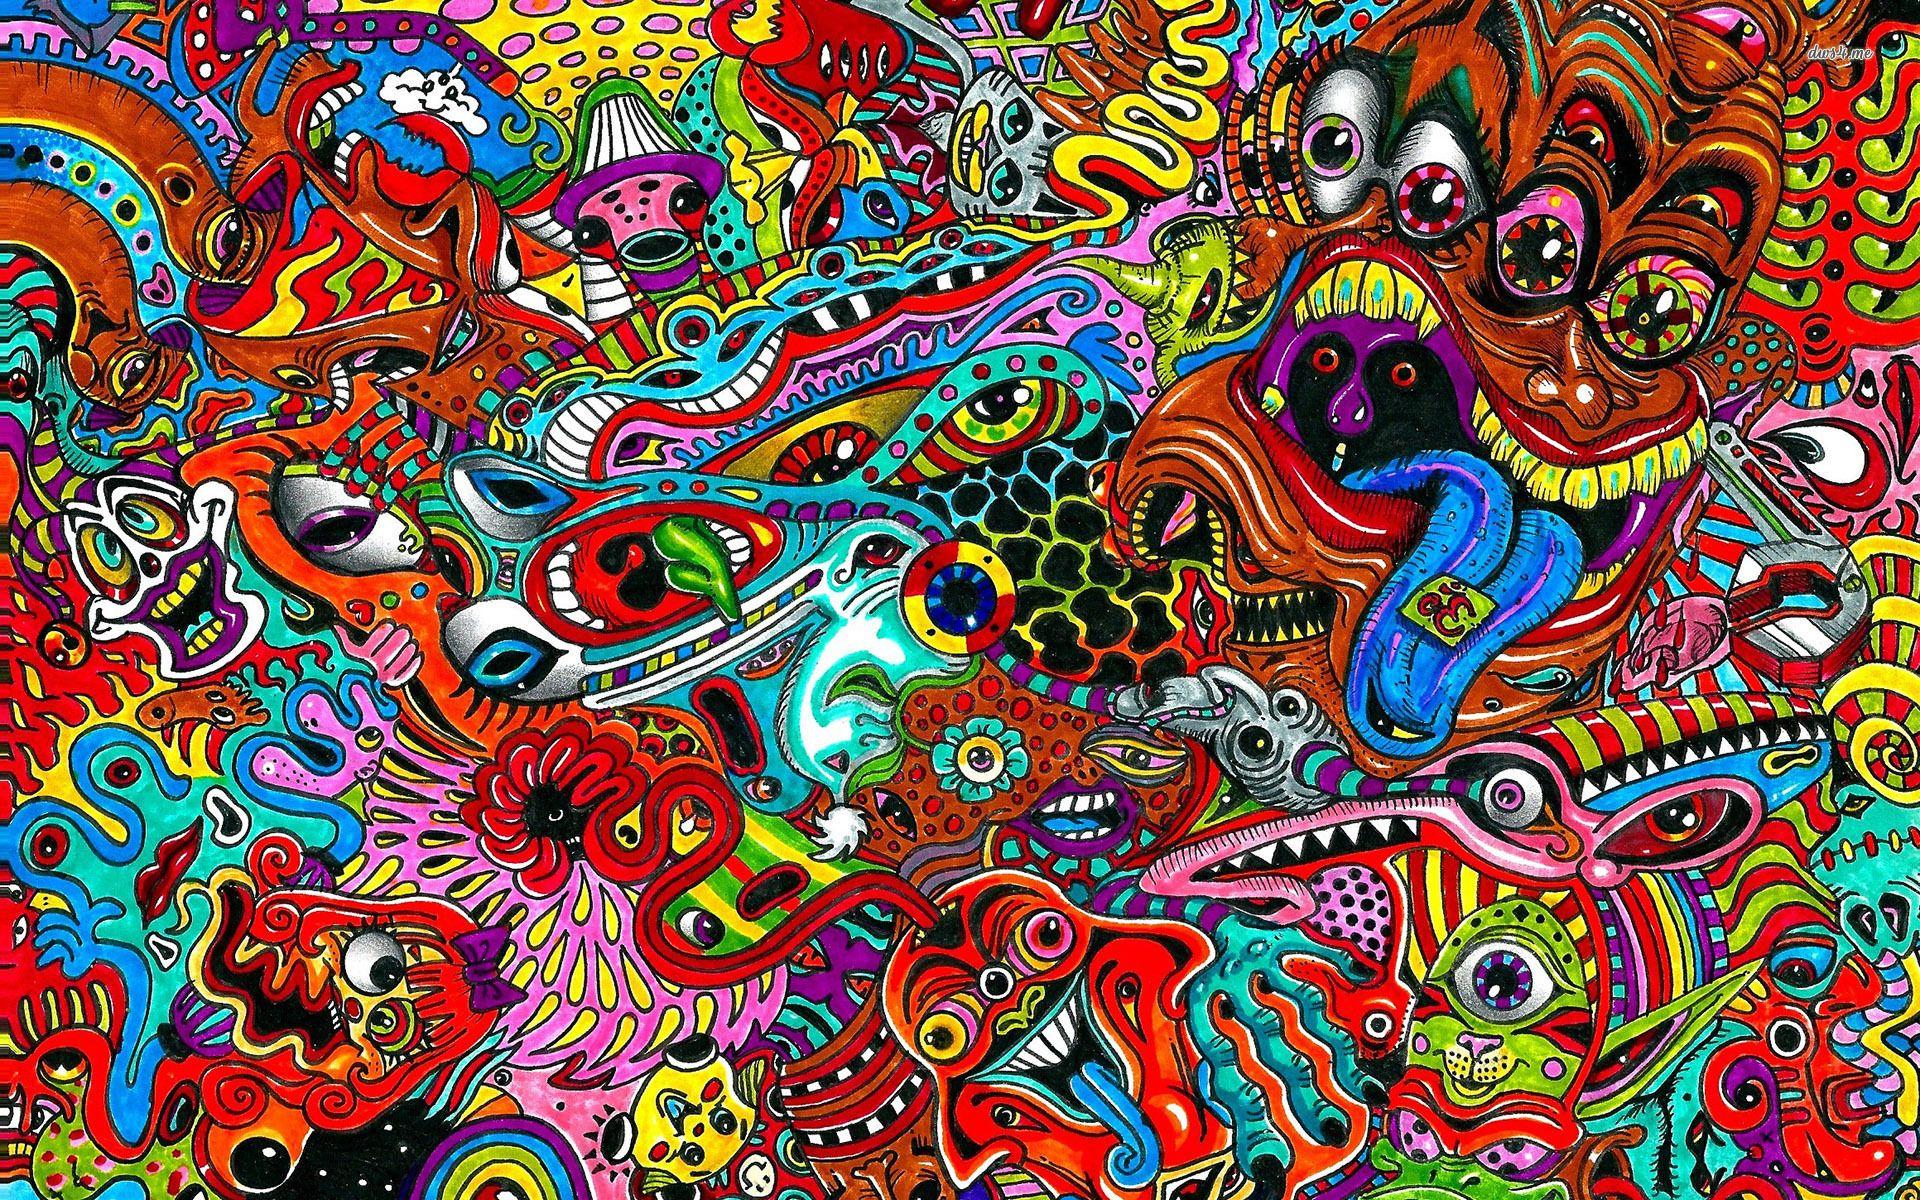 Trippy Cartoon Desktop Wallpapers - Wallpaper Cave